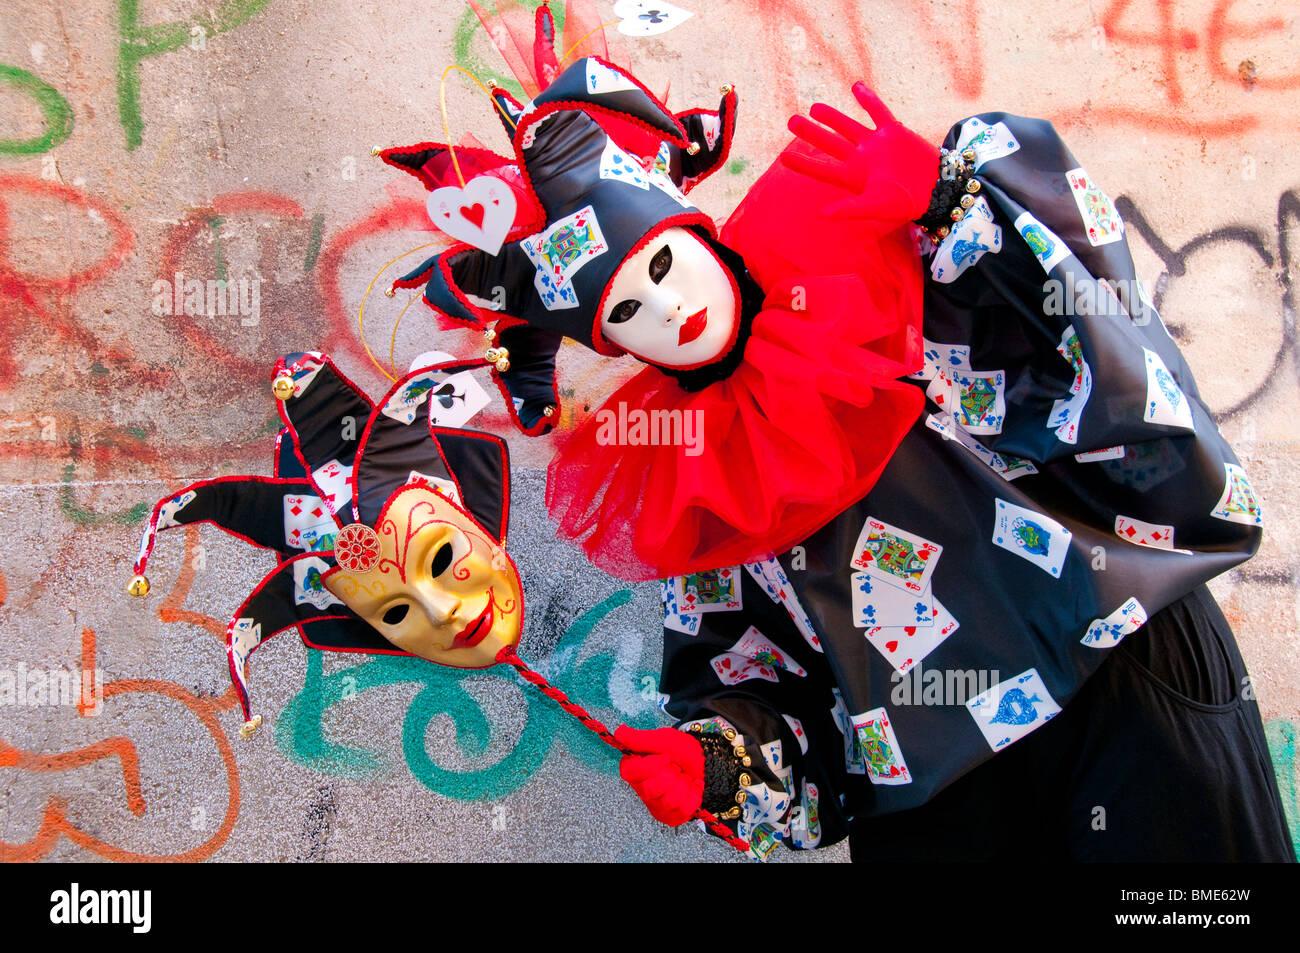 Venice Carnival, Italy, Costumed Jester joker participant - Stock Image